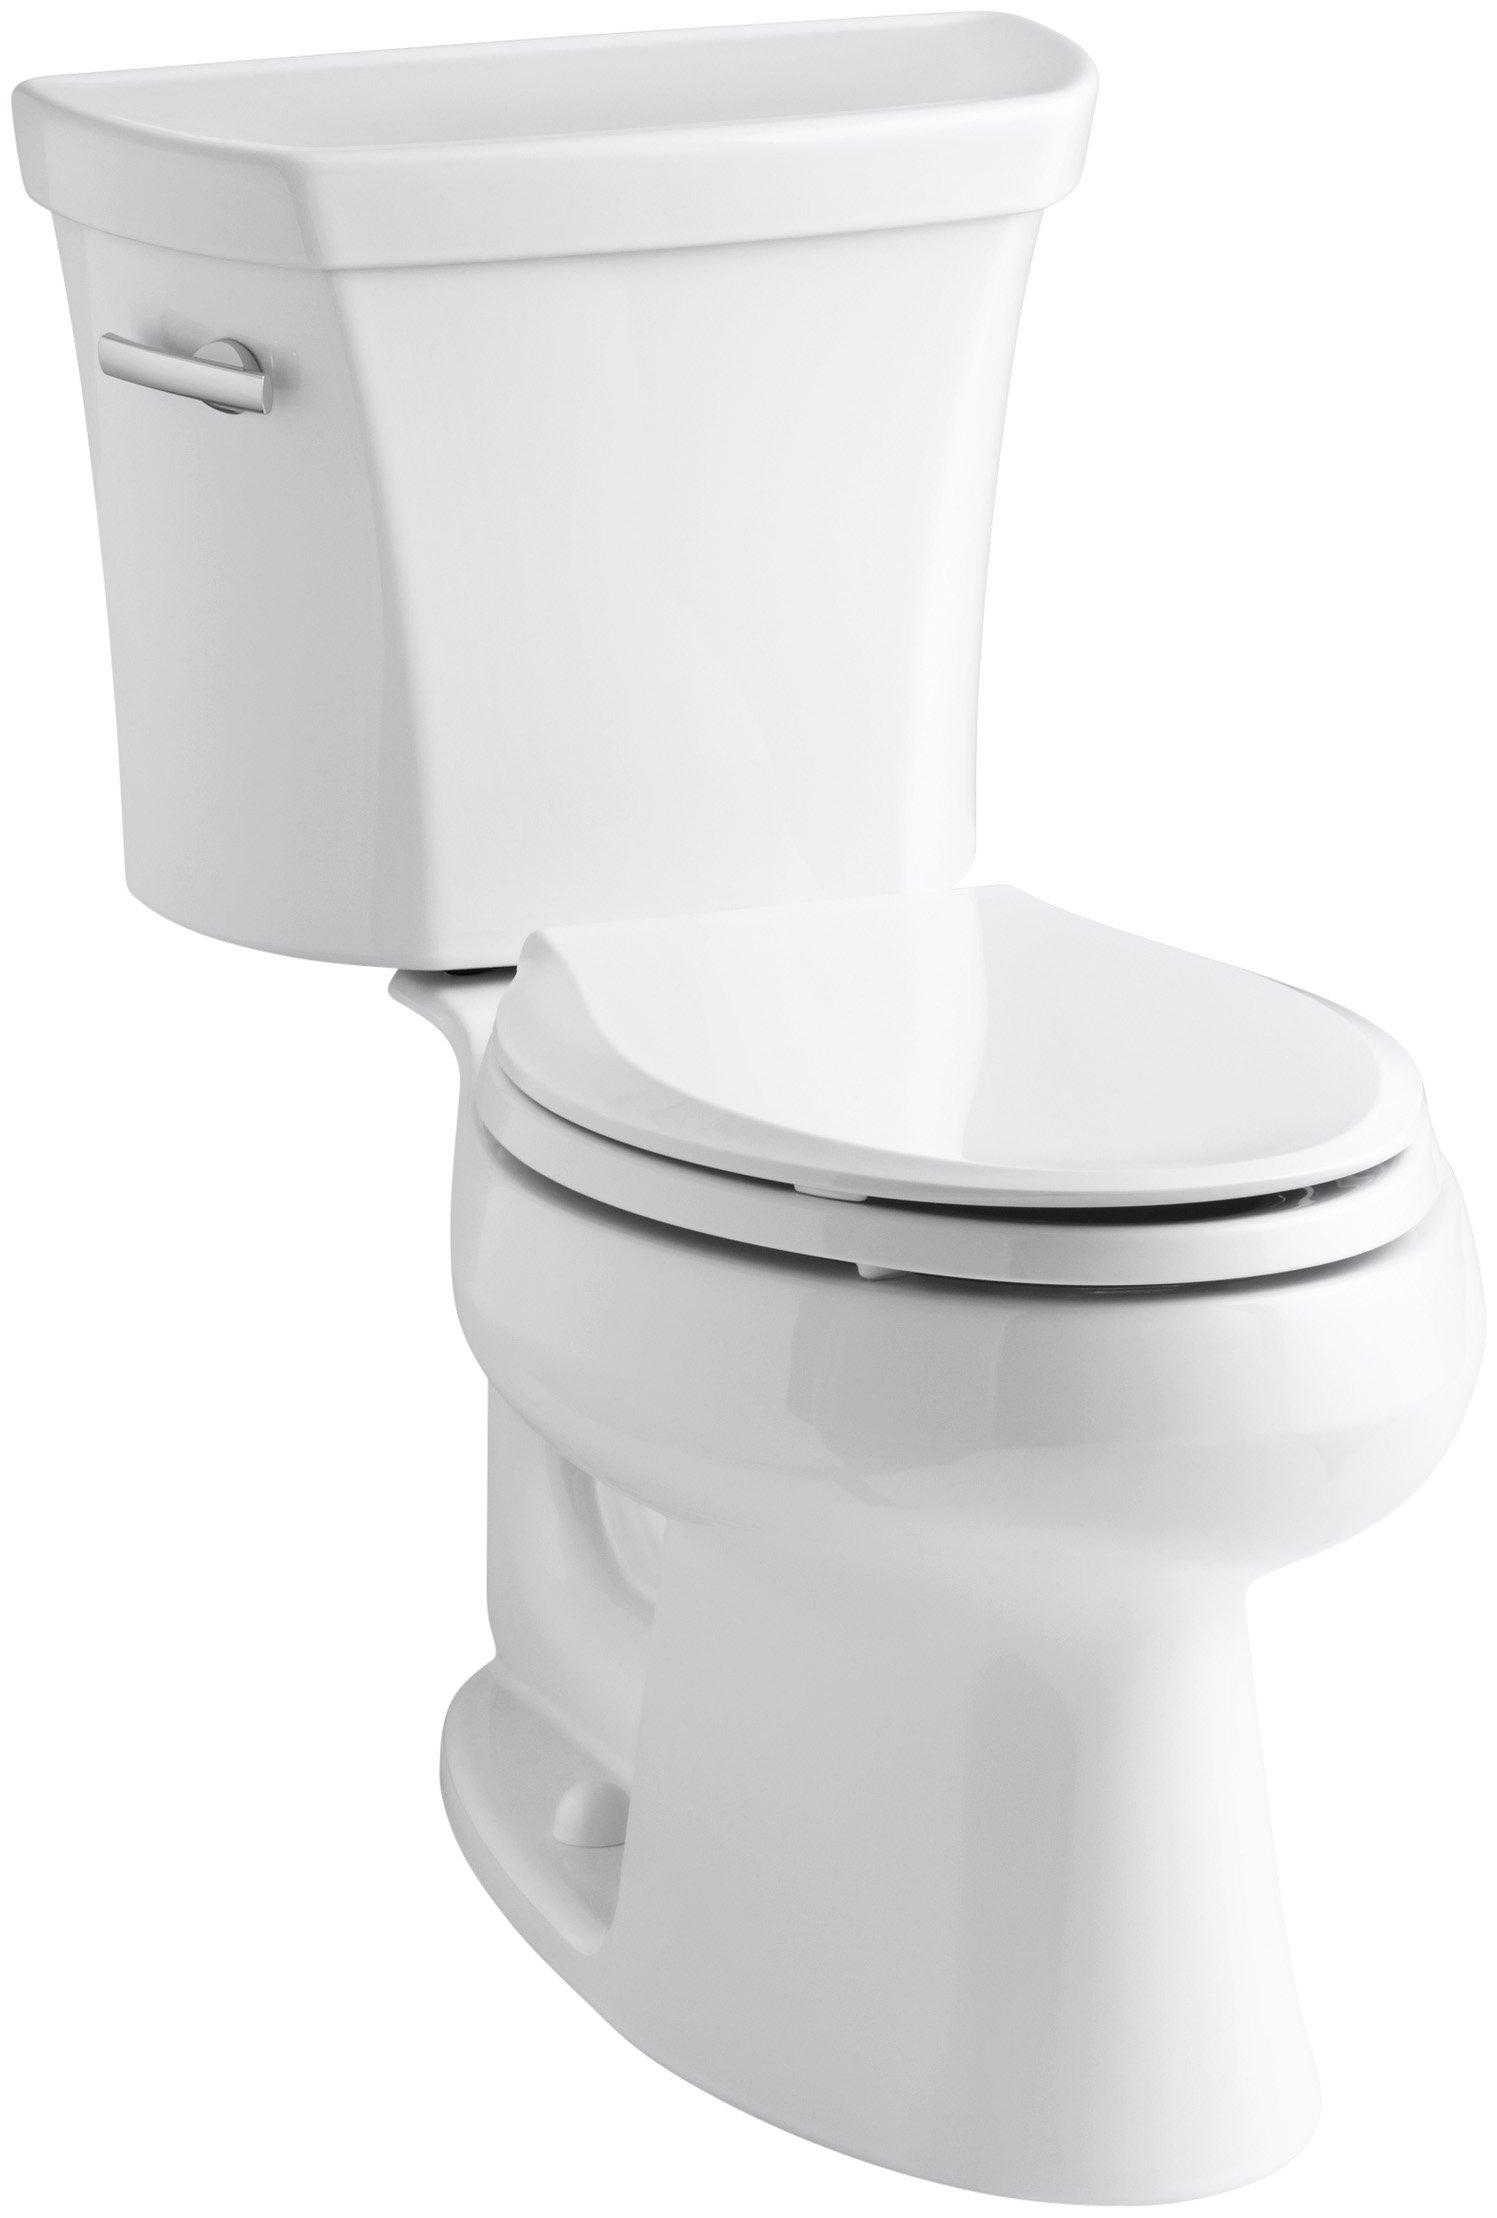 Kohler K 3998 0 Wellworth Elongated Toilet